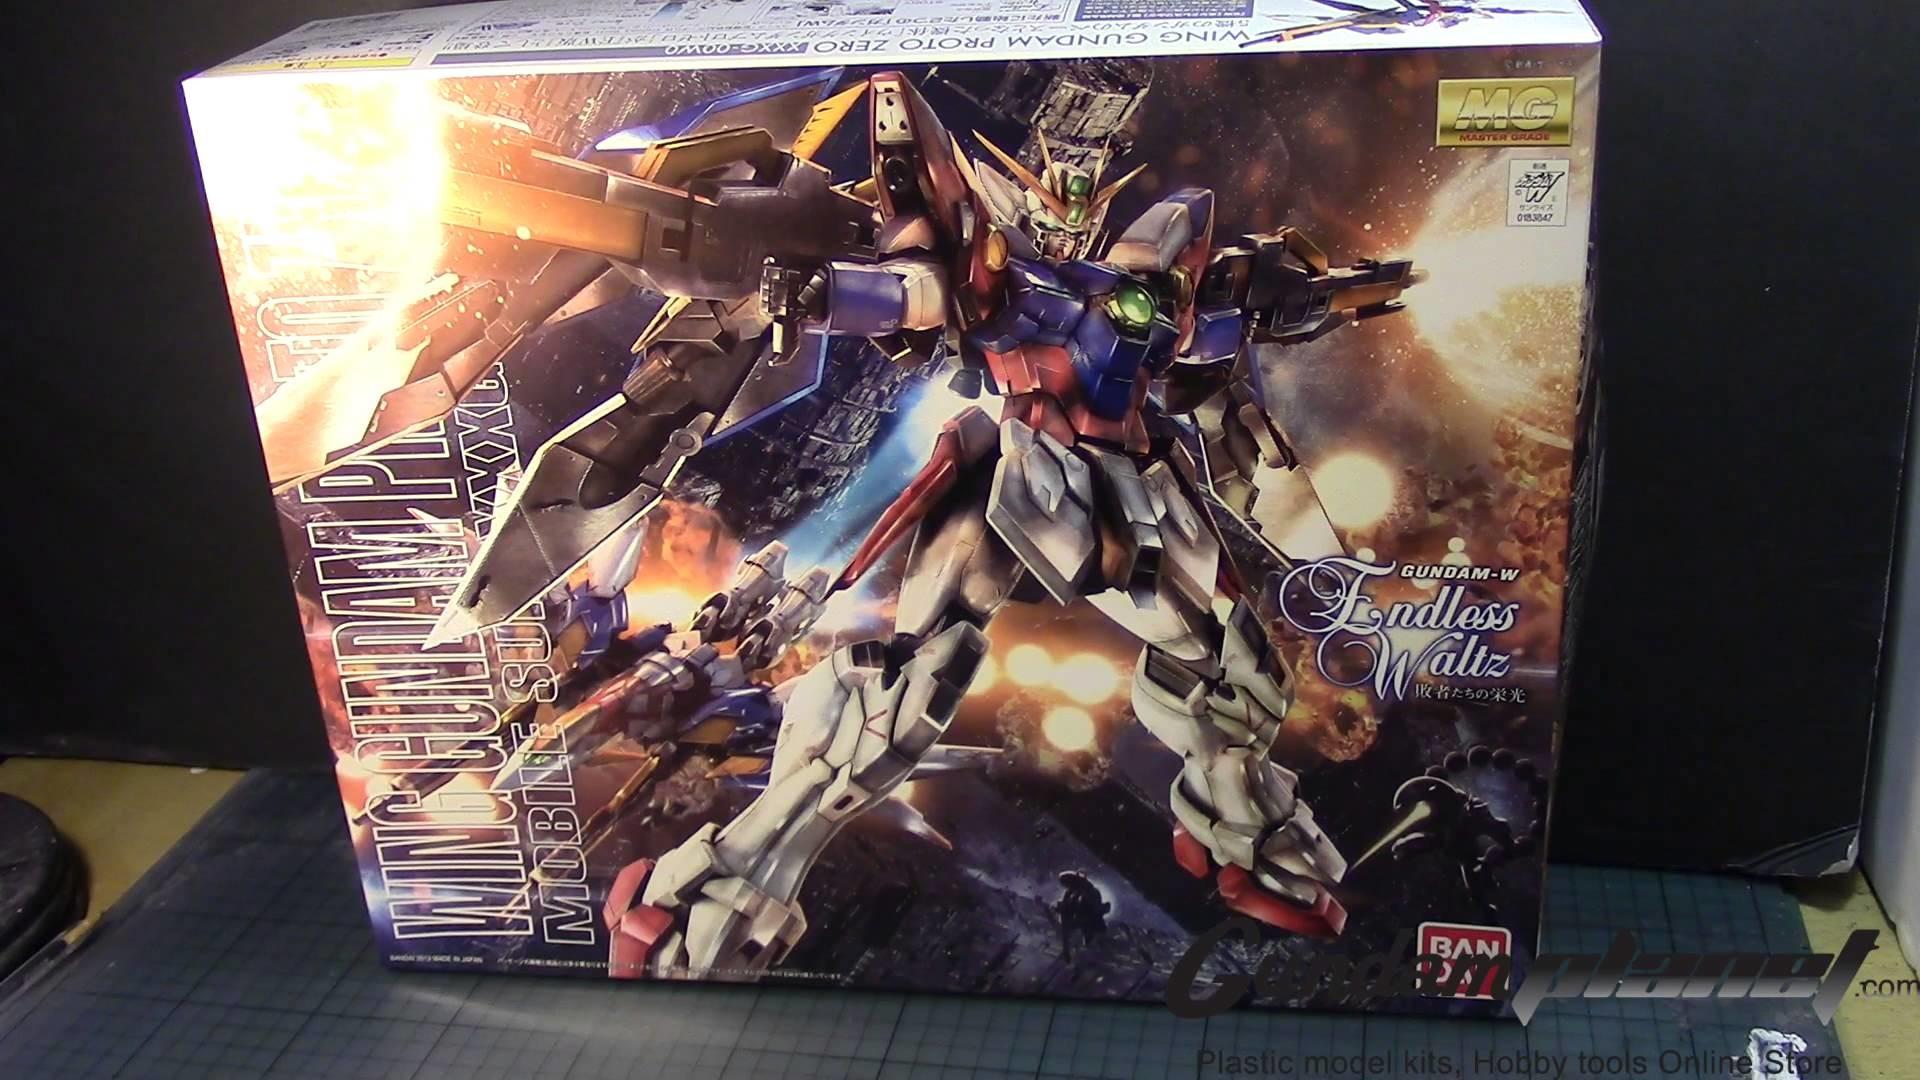 *GundamCustom* 1/100 MG Gundam Wing Proto Zero Custom – Part 1 – YouTube